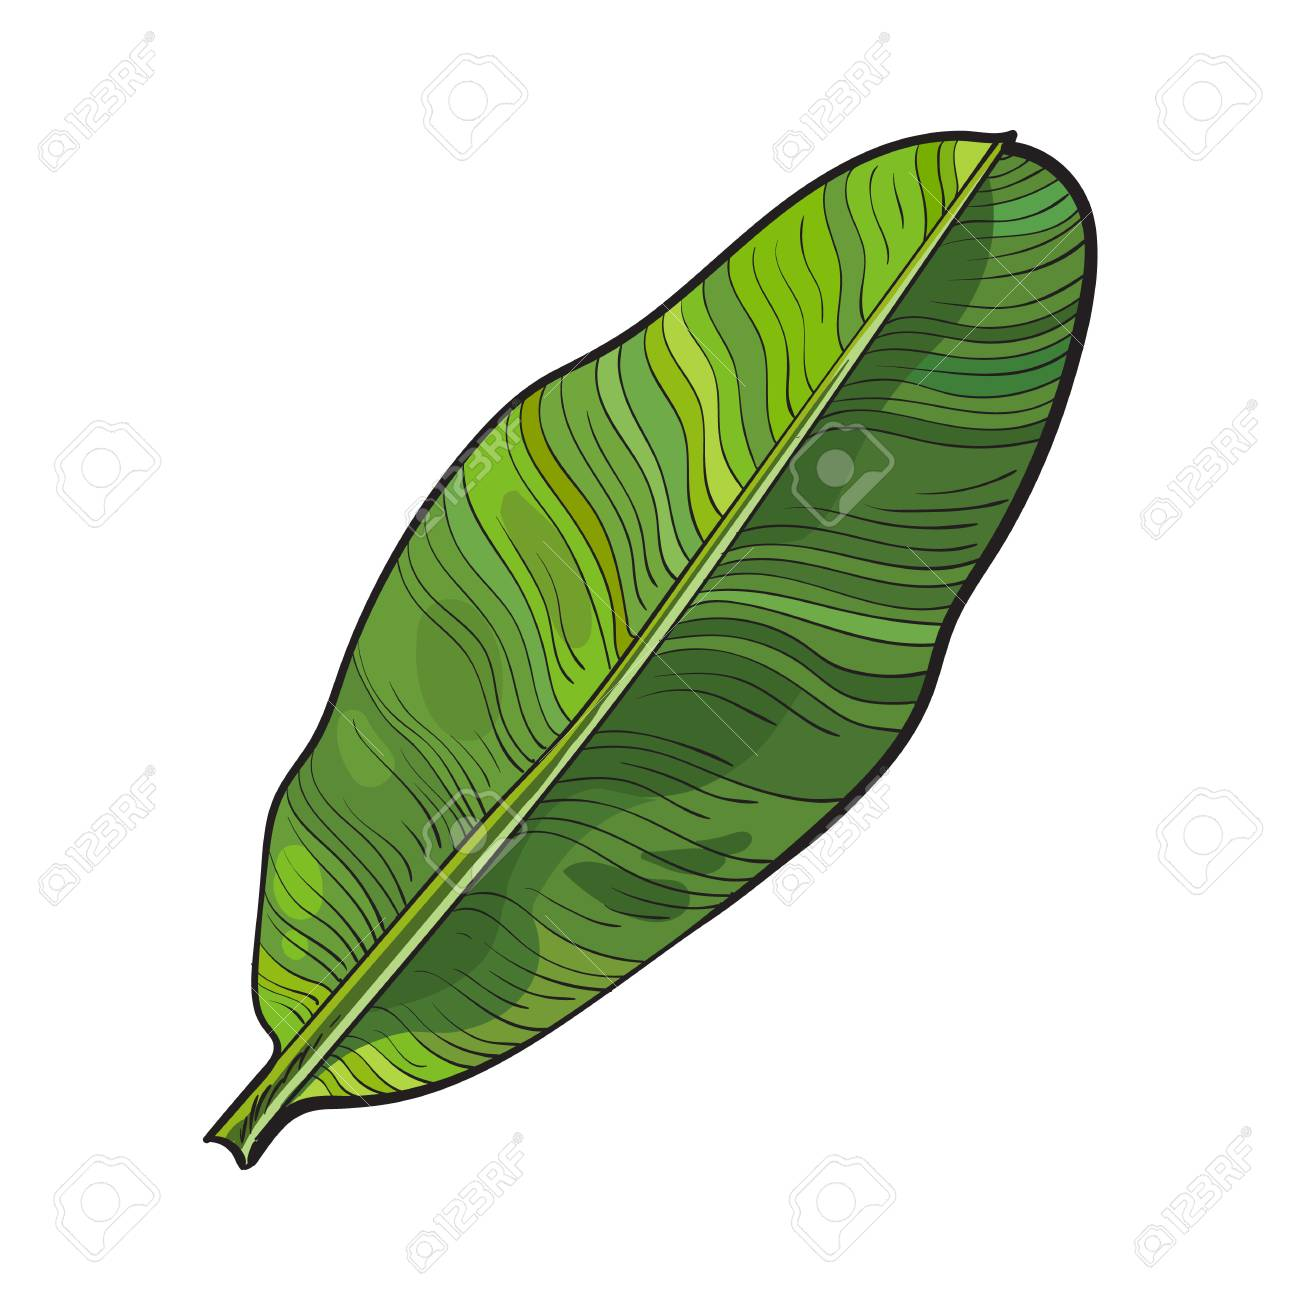 1300x1300 Full Fresh Leaf Of Banana Palm Tree, Sketch Style Vector